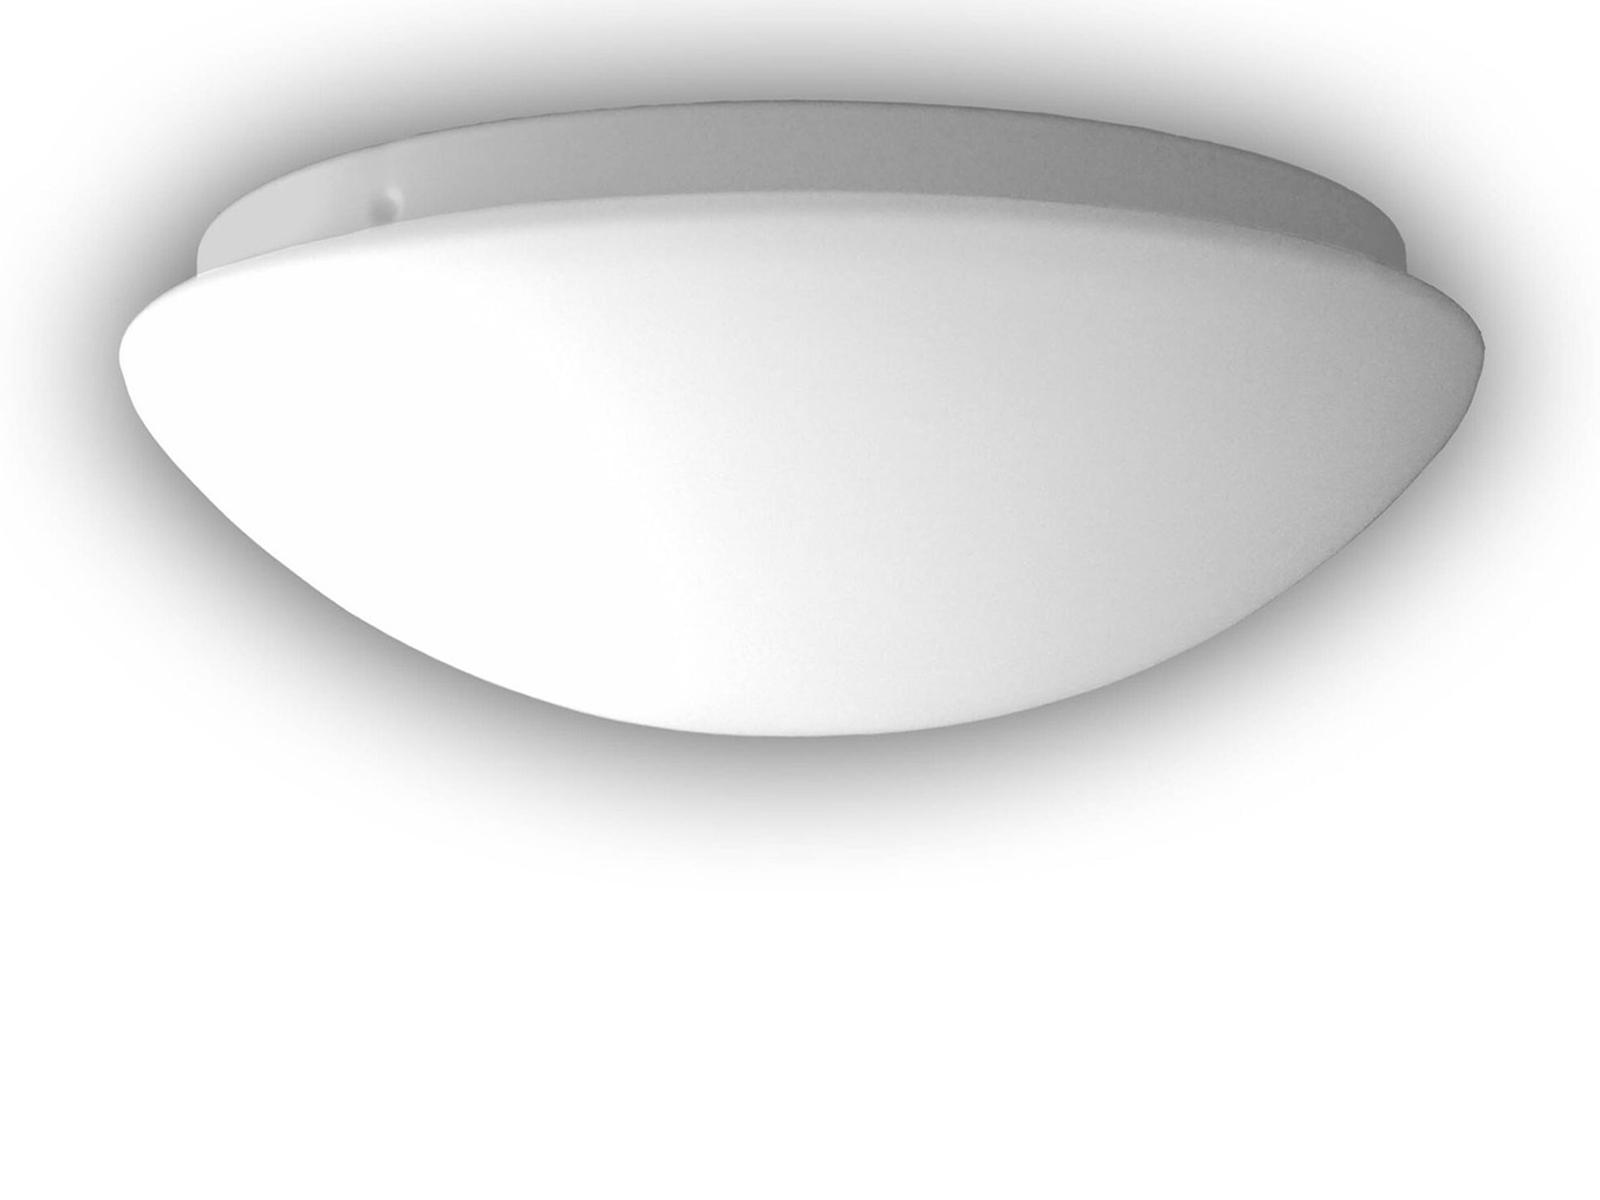 LED Glasleuchte Ø 45cm LED Deckenlampe dimmbar rund Opal Glas matt Wandlampe